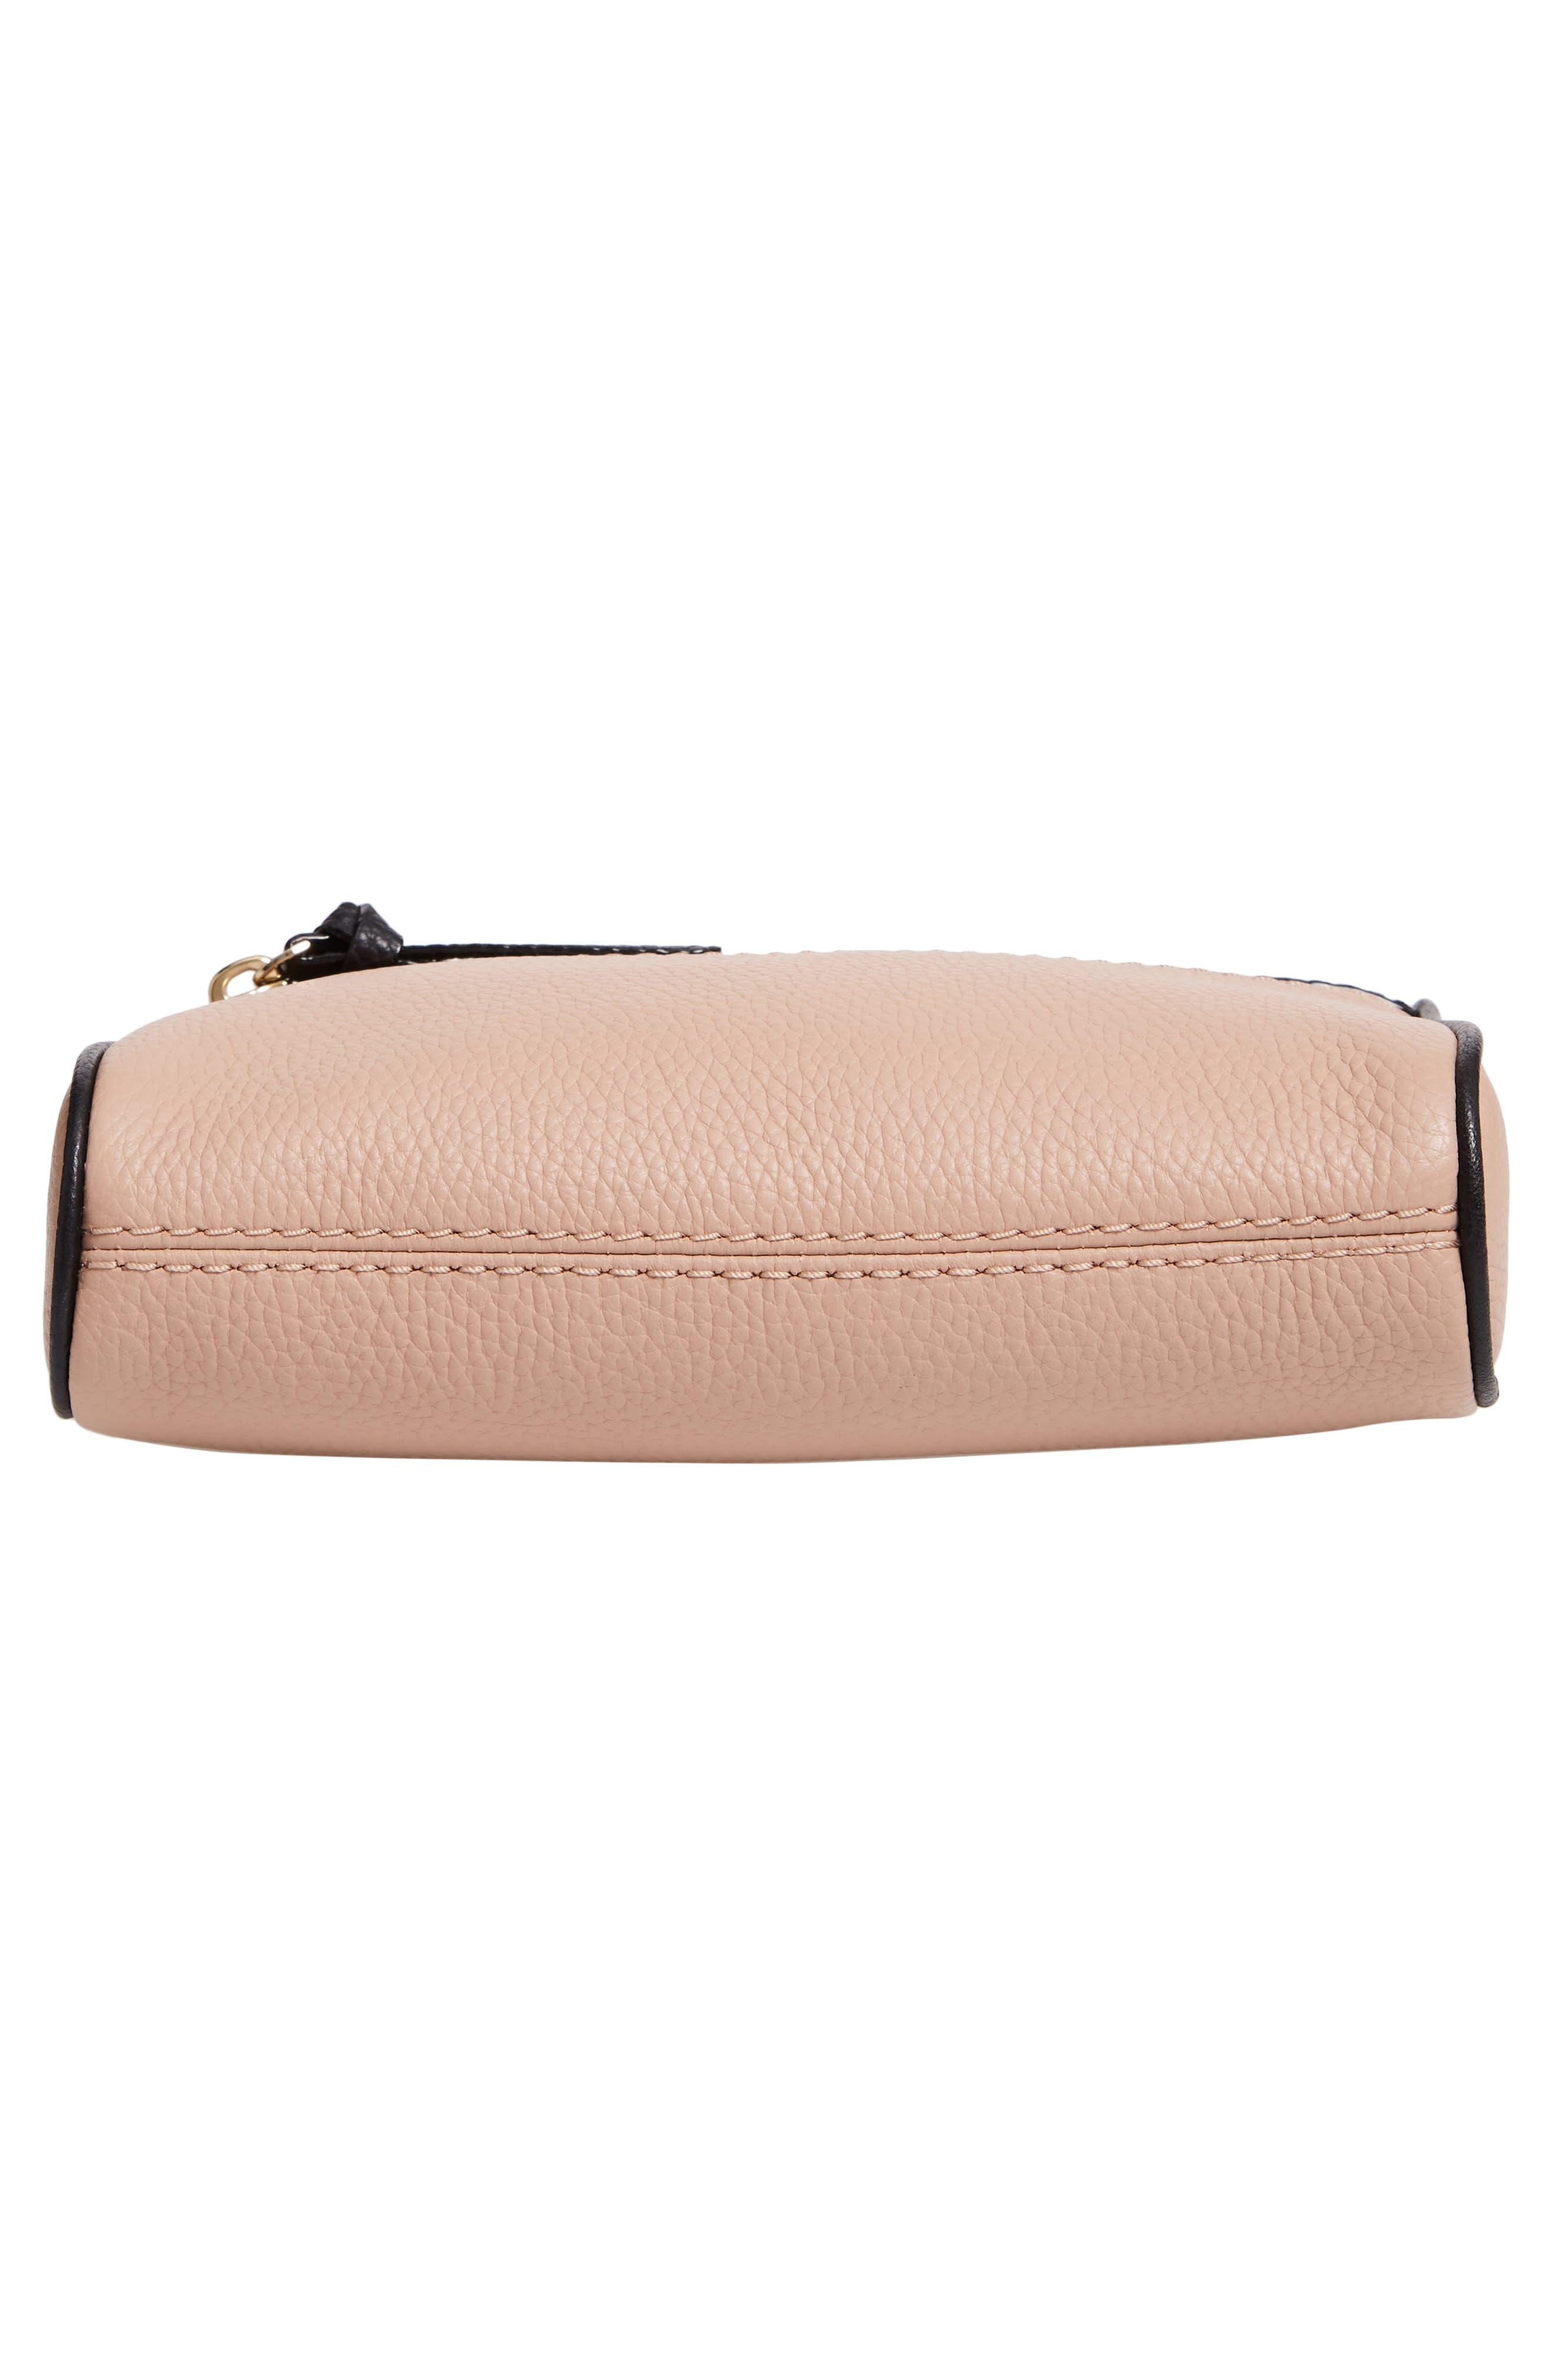 mini jackson street - cayli crossbody bag,                             Alternate thumbnail 6, color,                             950